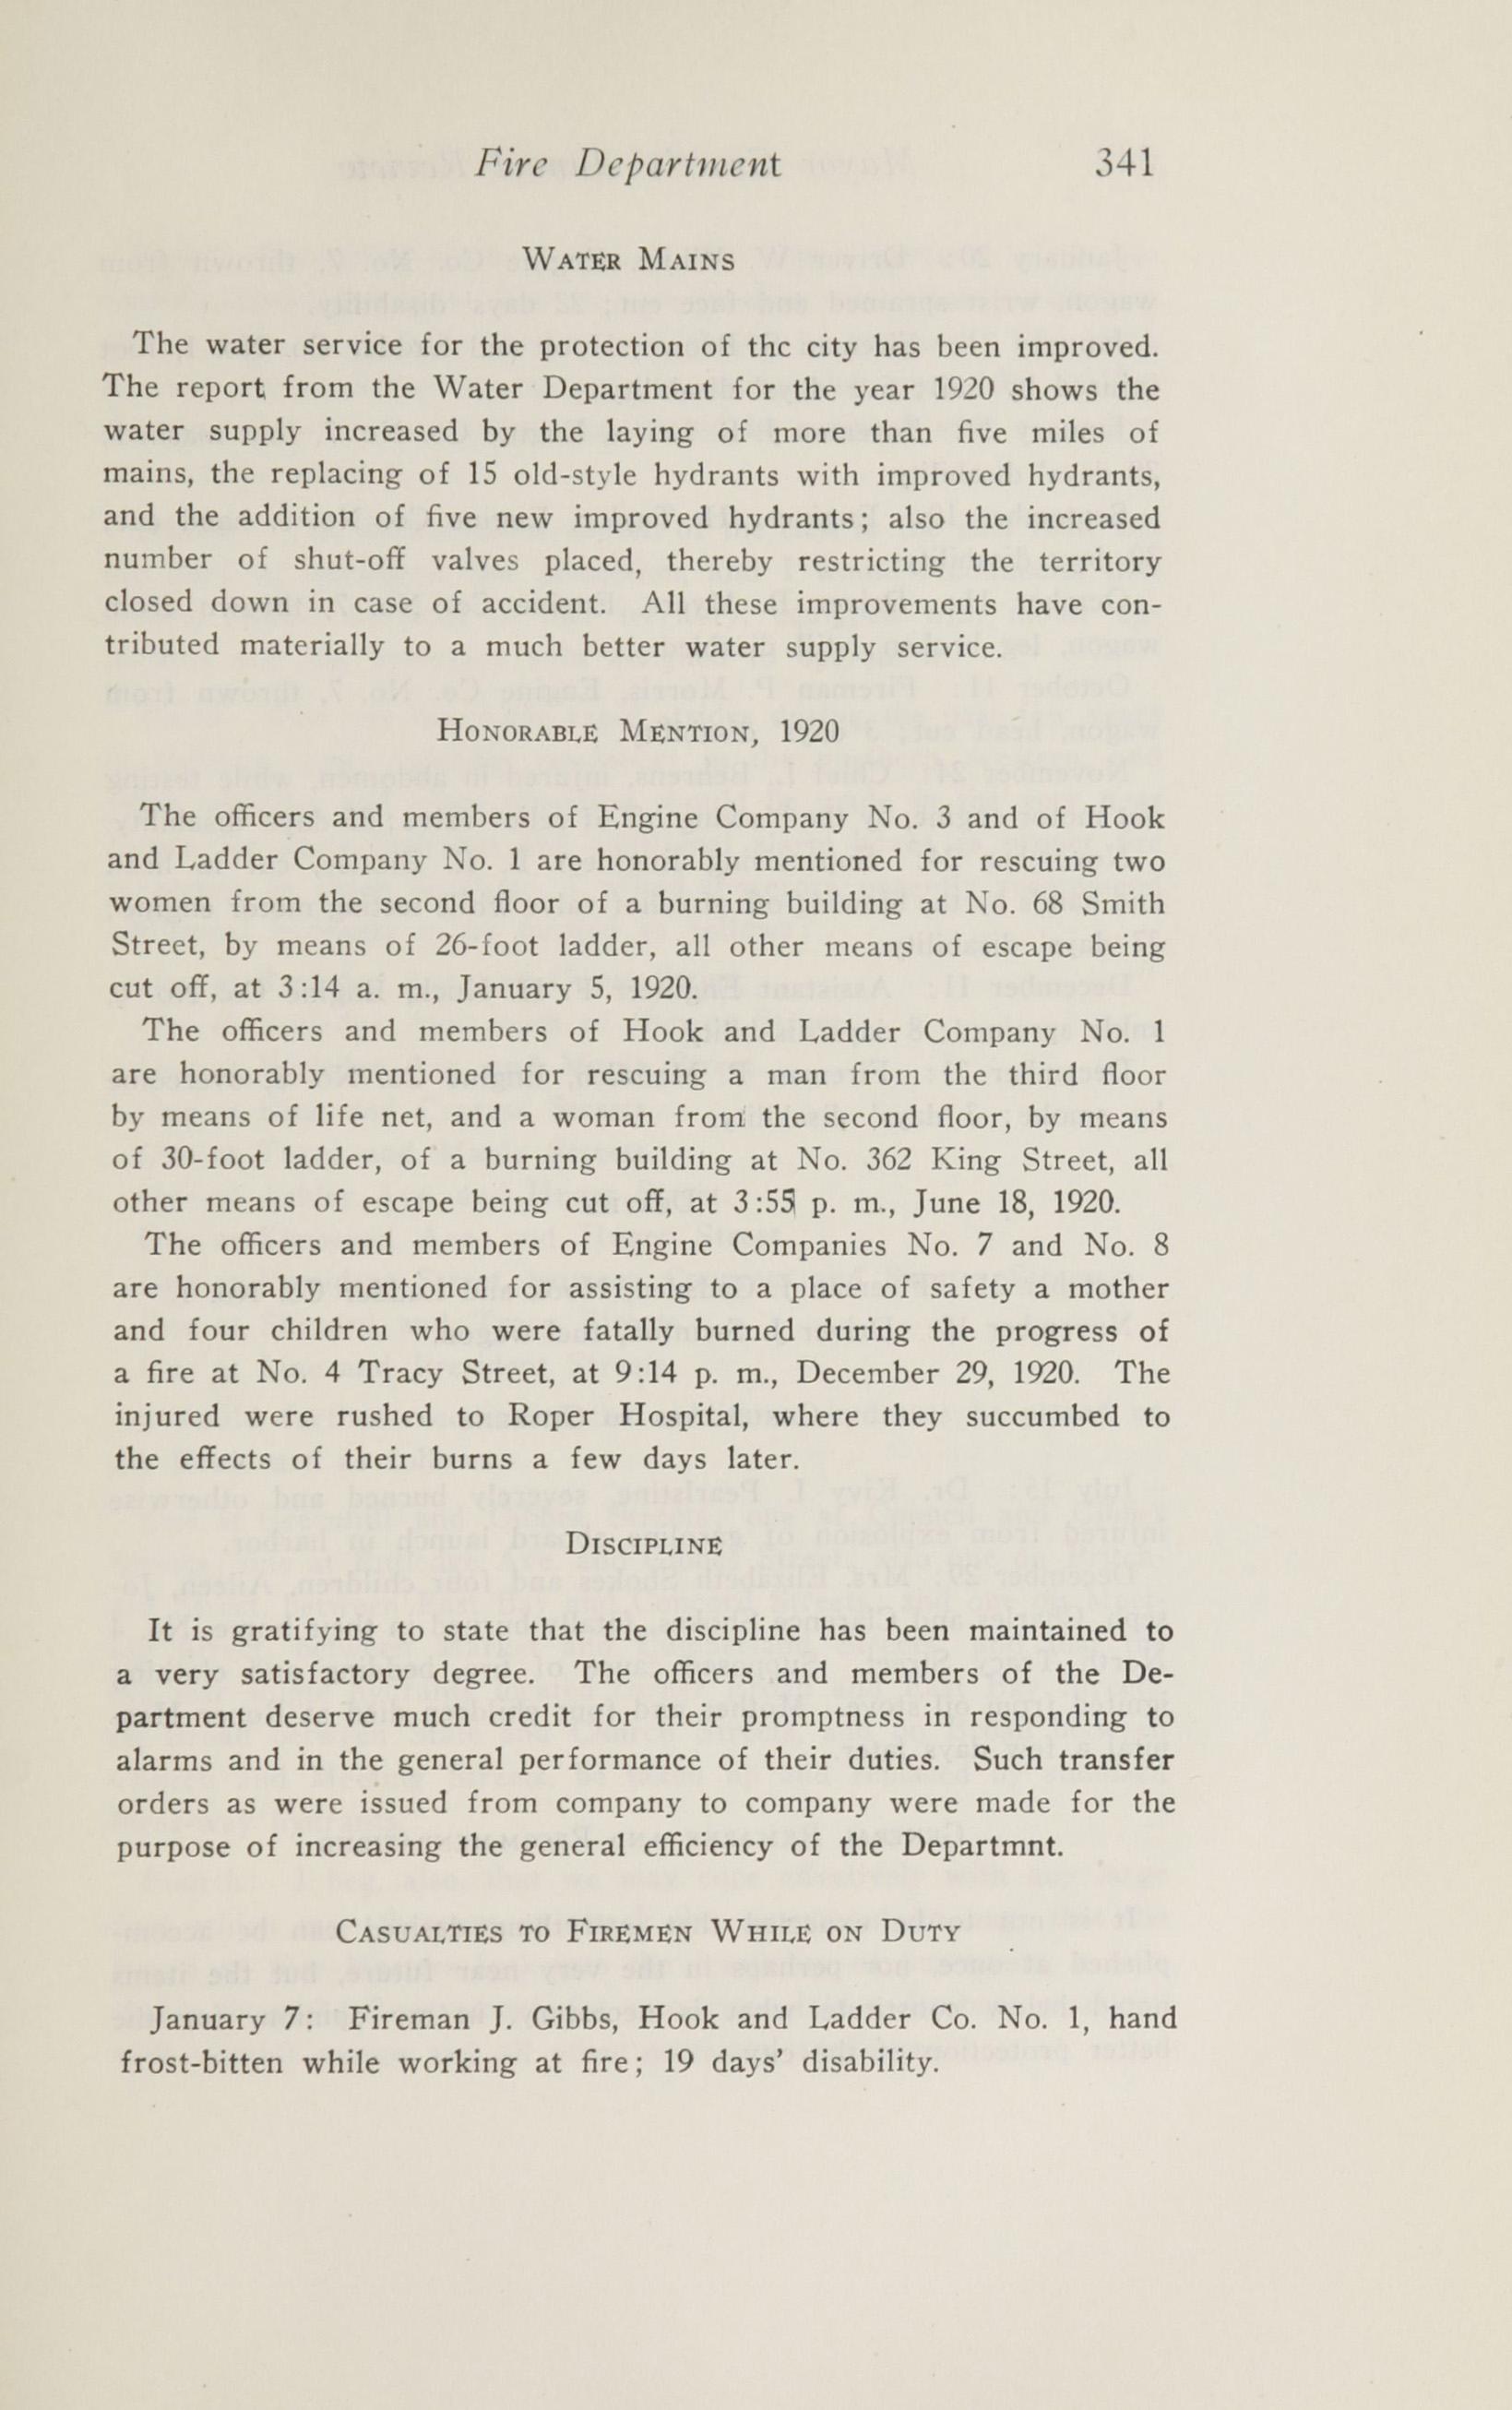 Charleston Yearbook, 1920, page 341